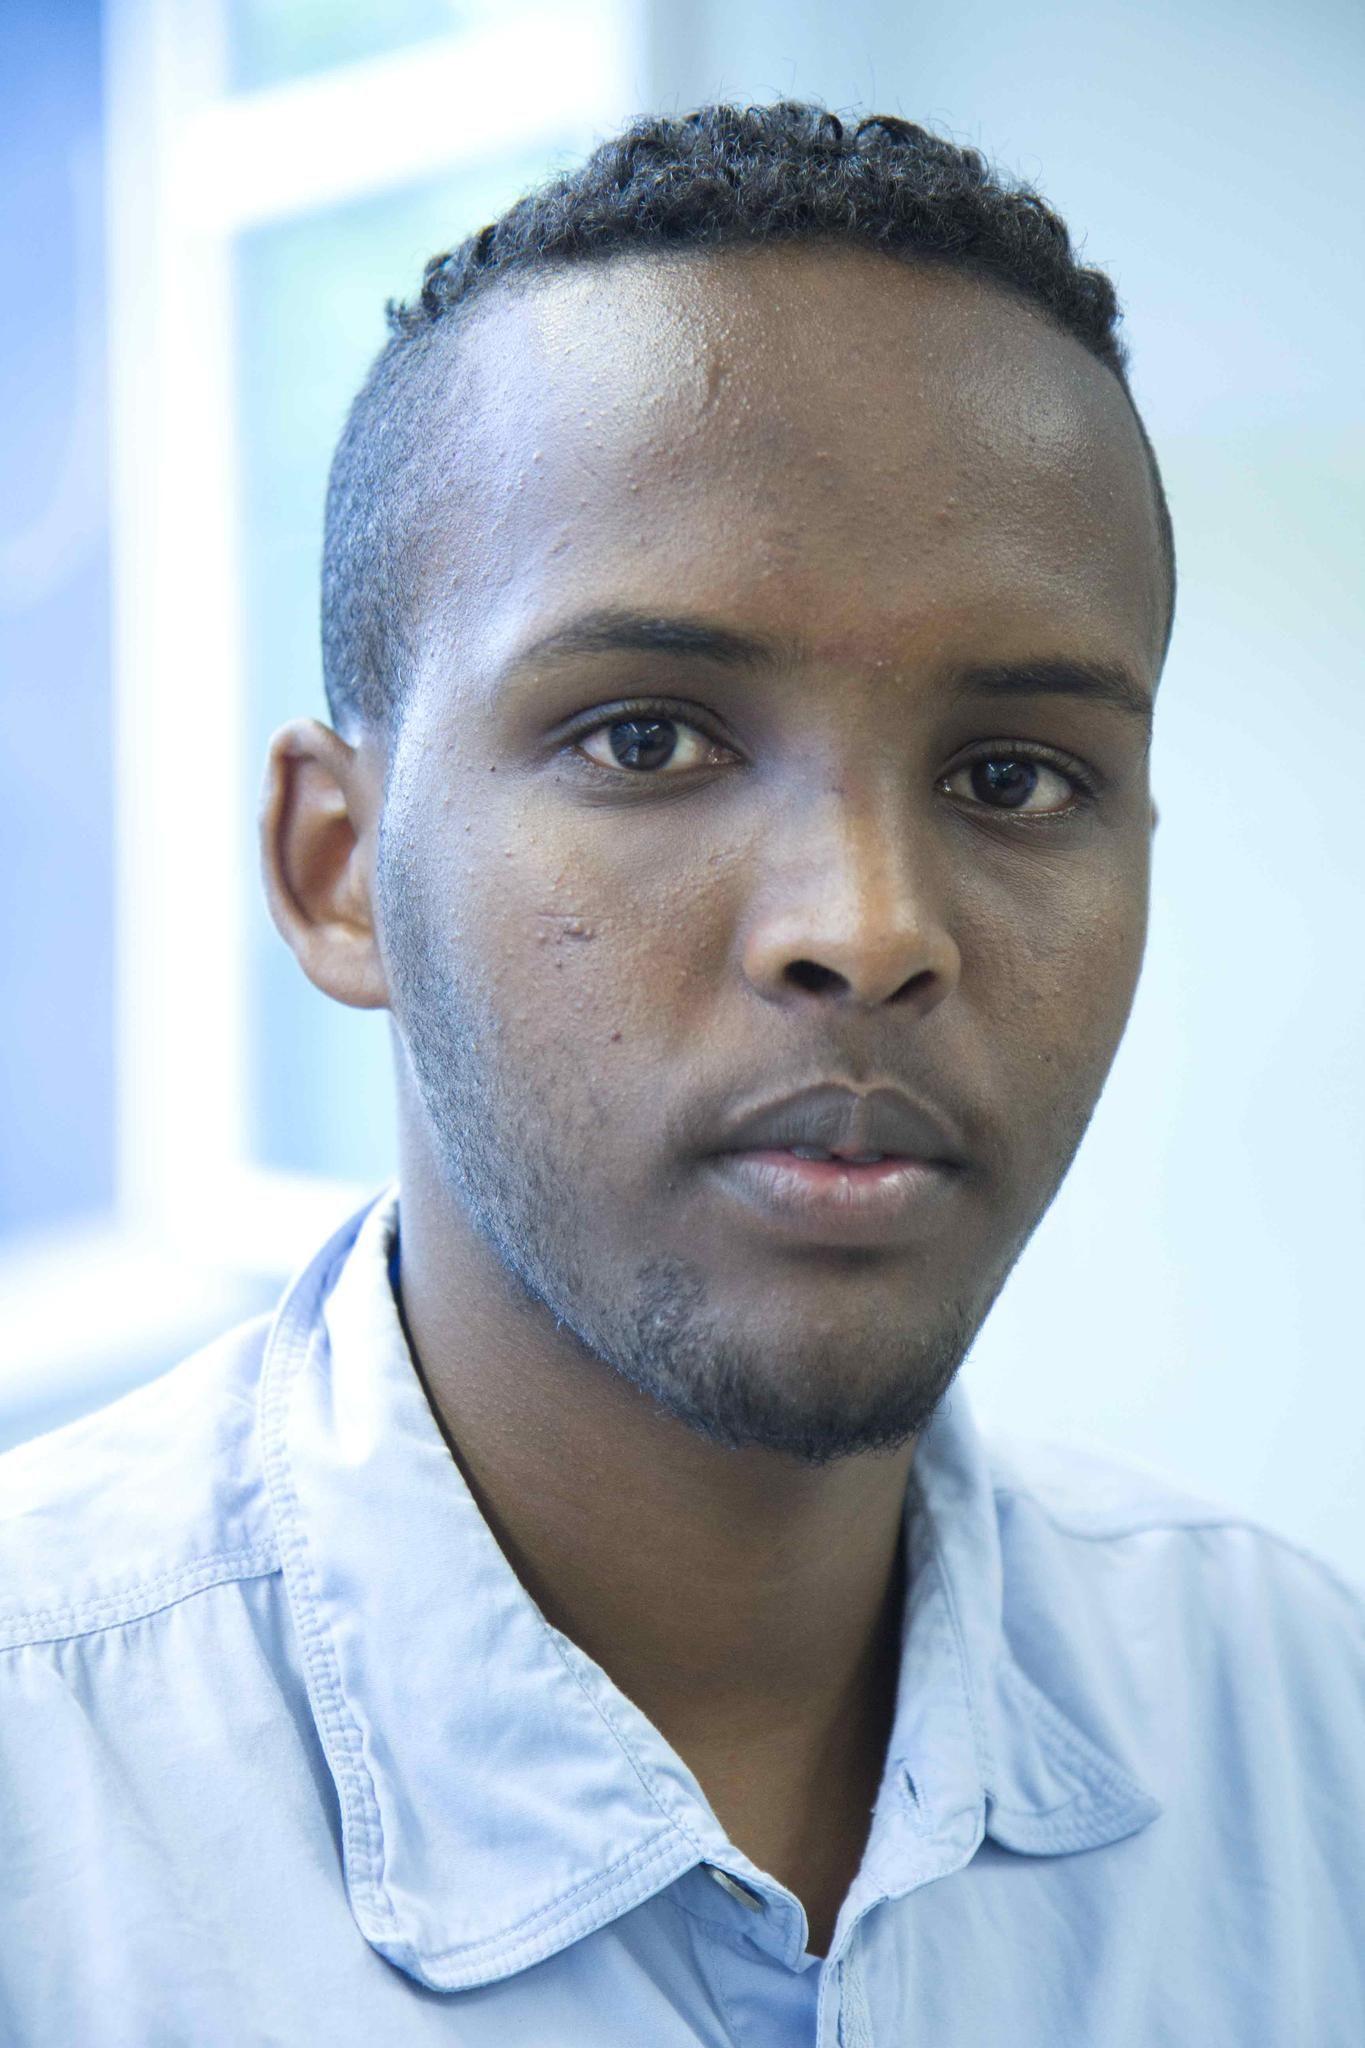 8.-Ahmed spon edit